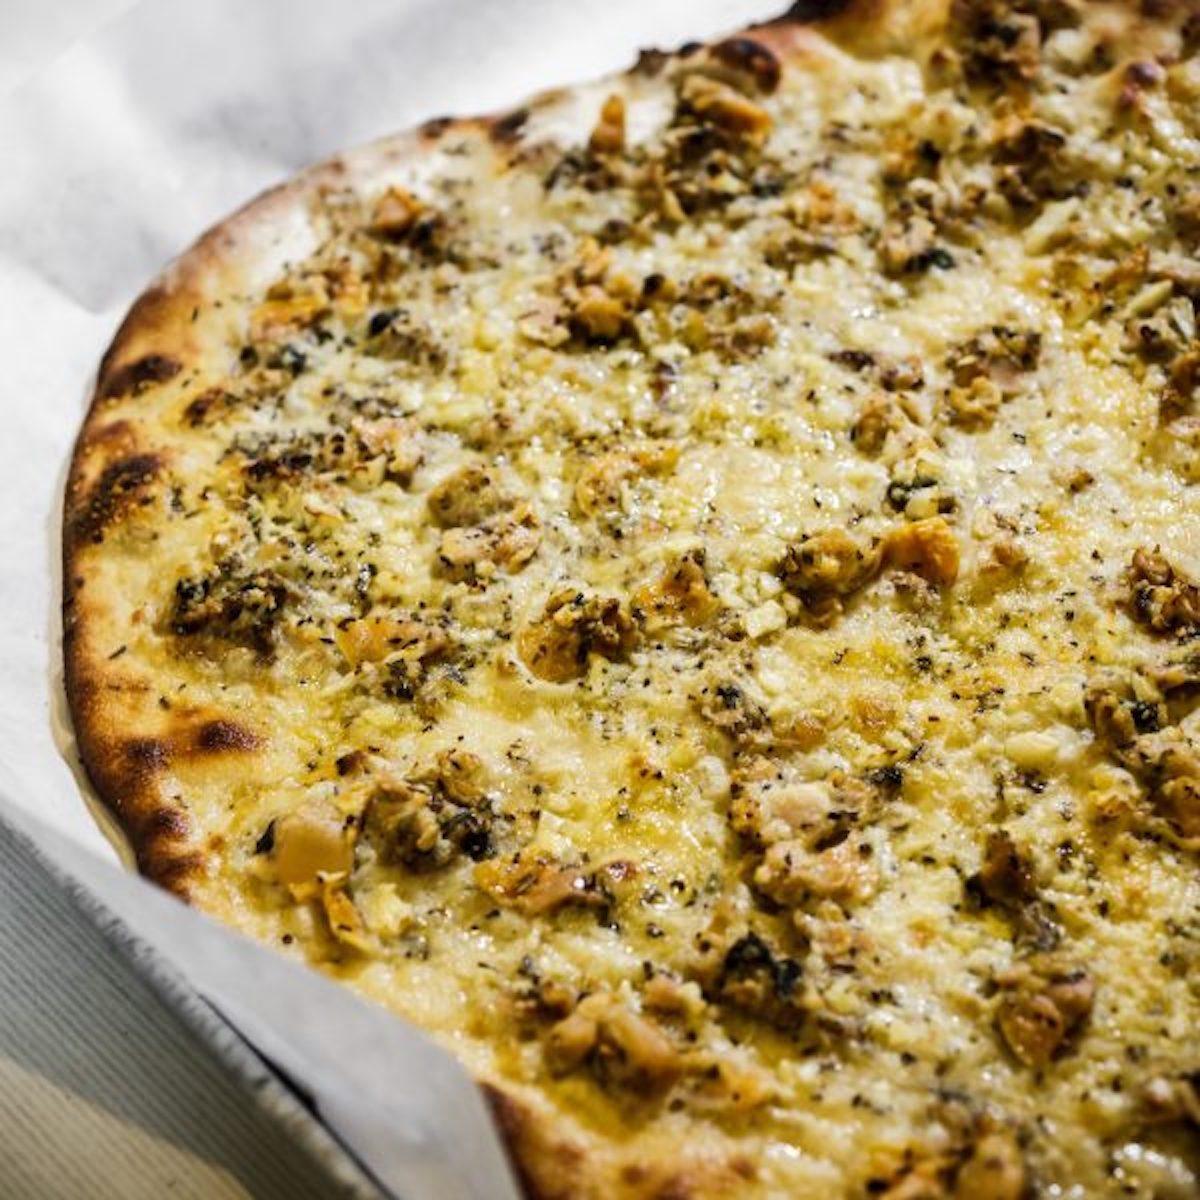 The Original Frank Pepe Pizzeria Napoletana